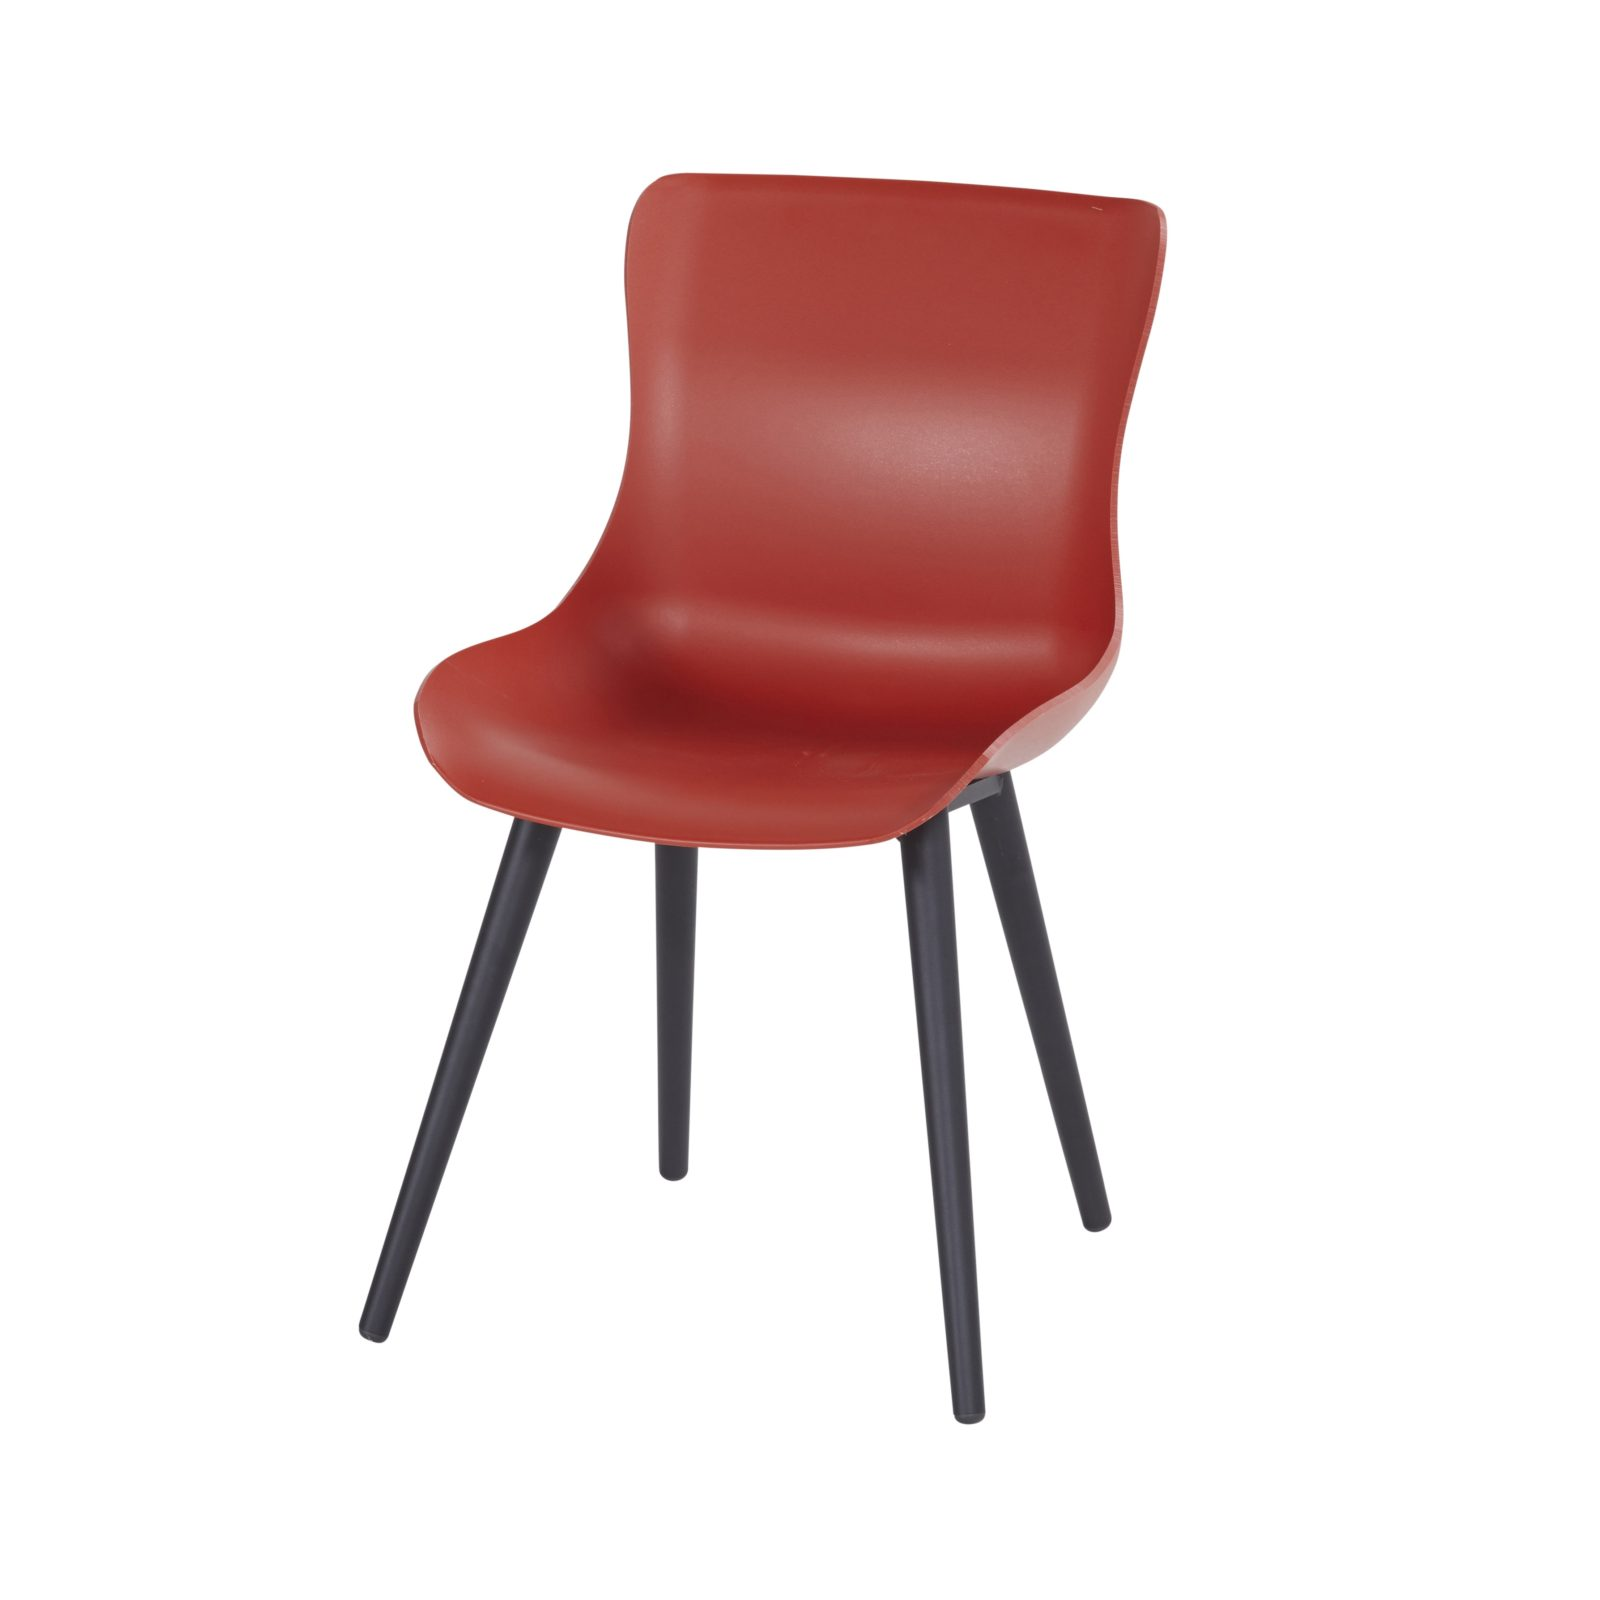 Sophie studio spisestol rød/sort